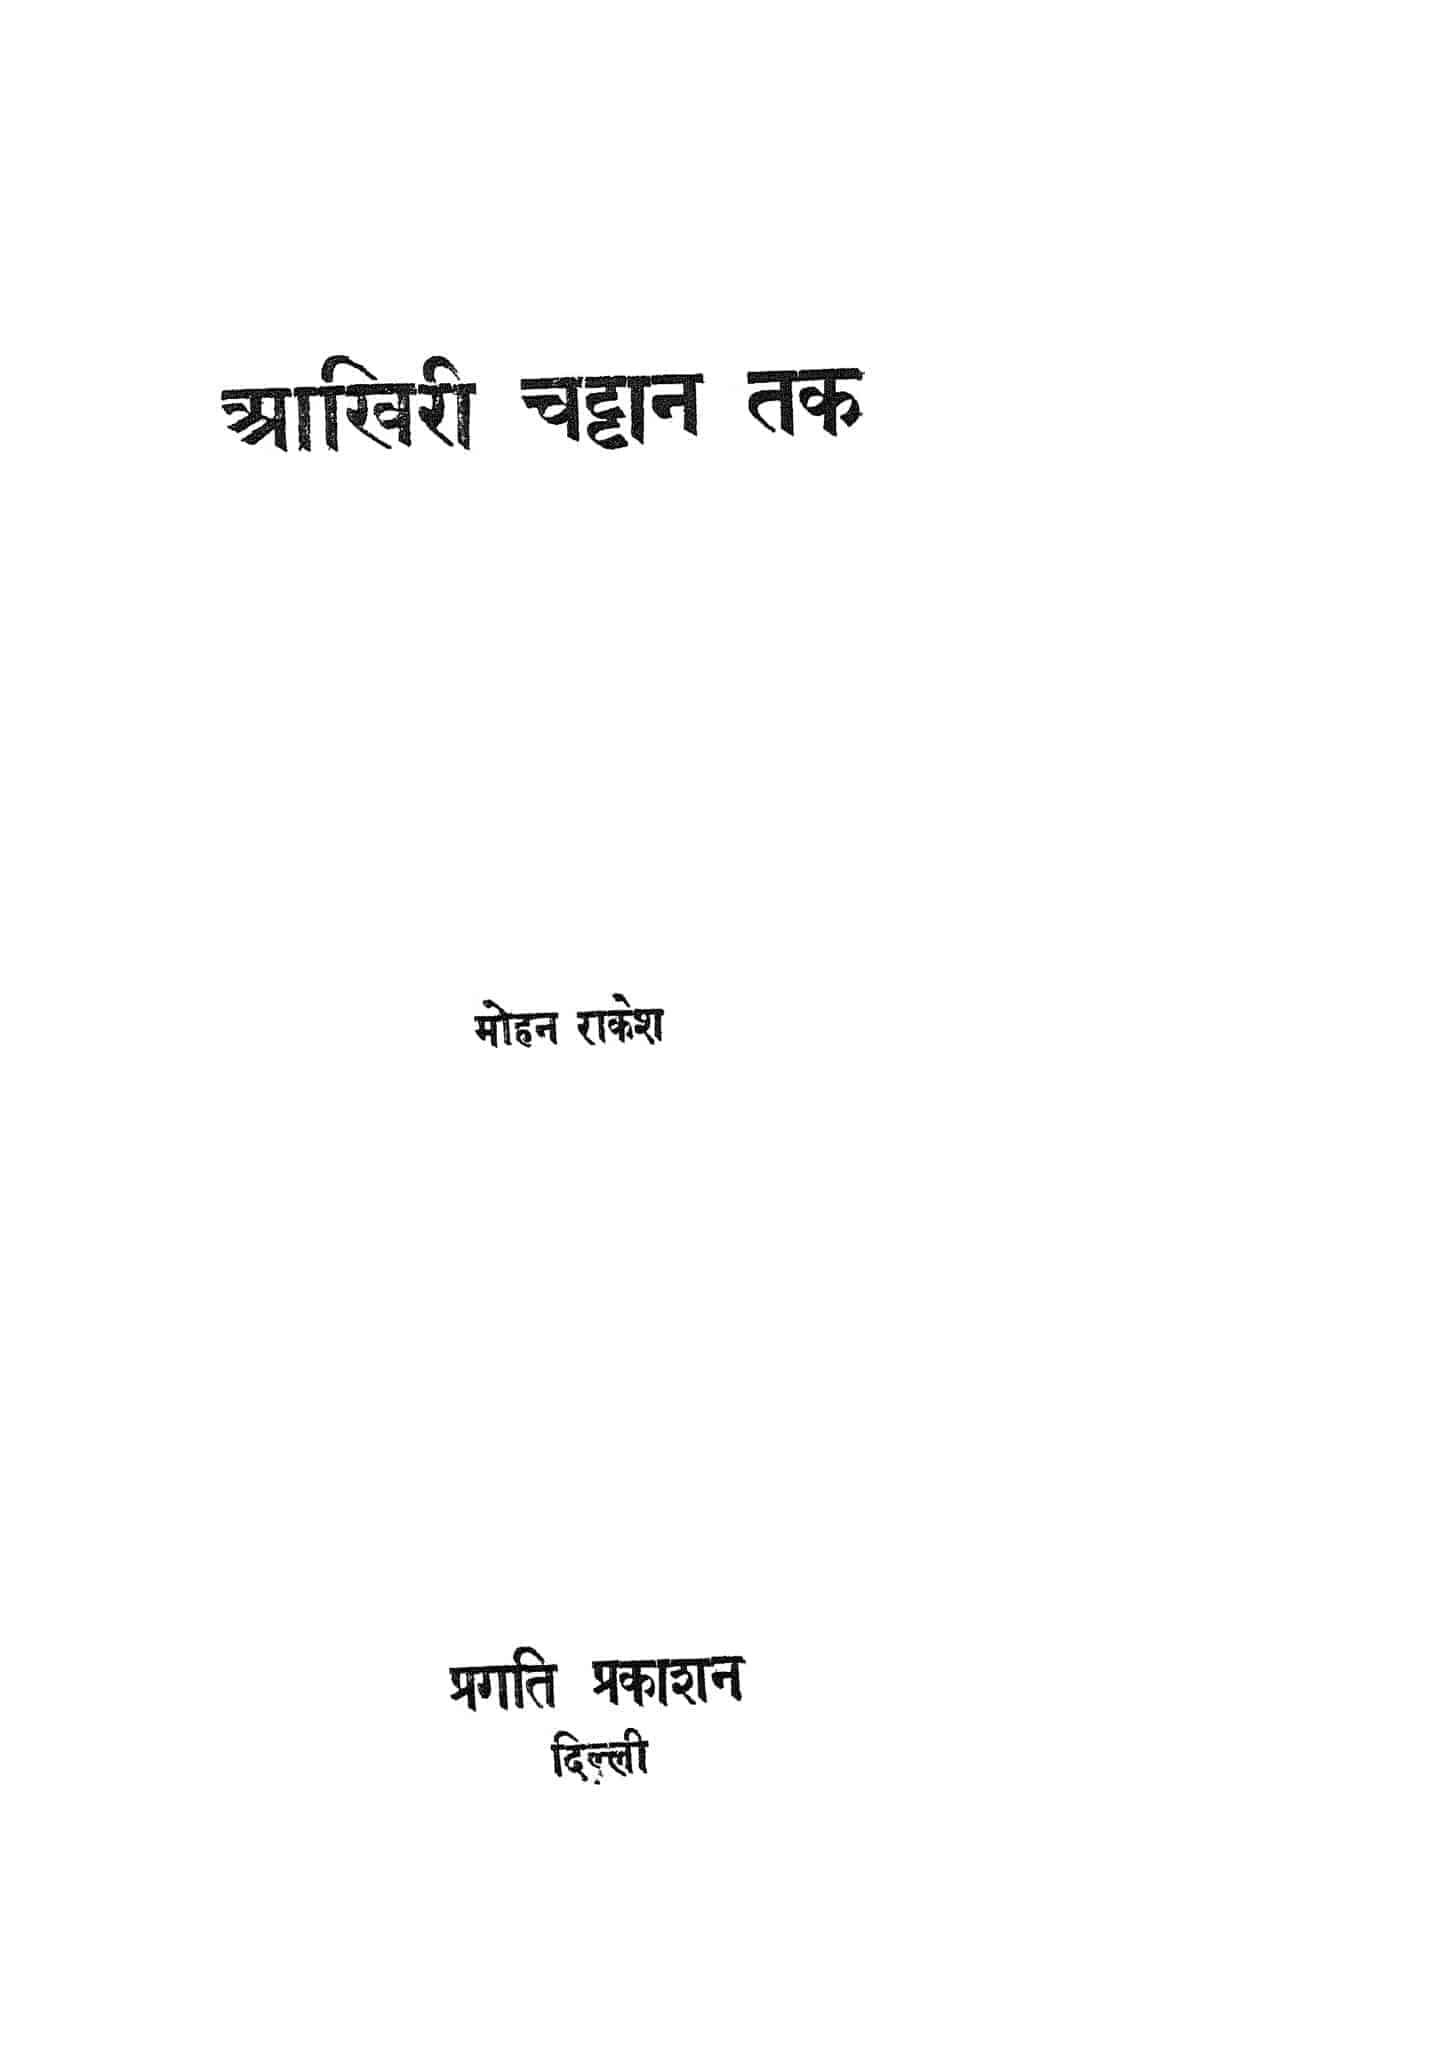 Book Image : आखिरी चट्टान तक - Aakhiri Chattan Tak